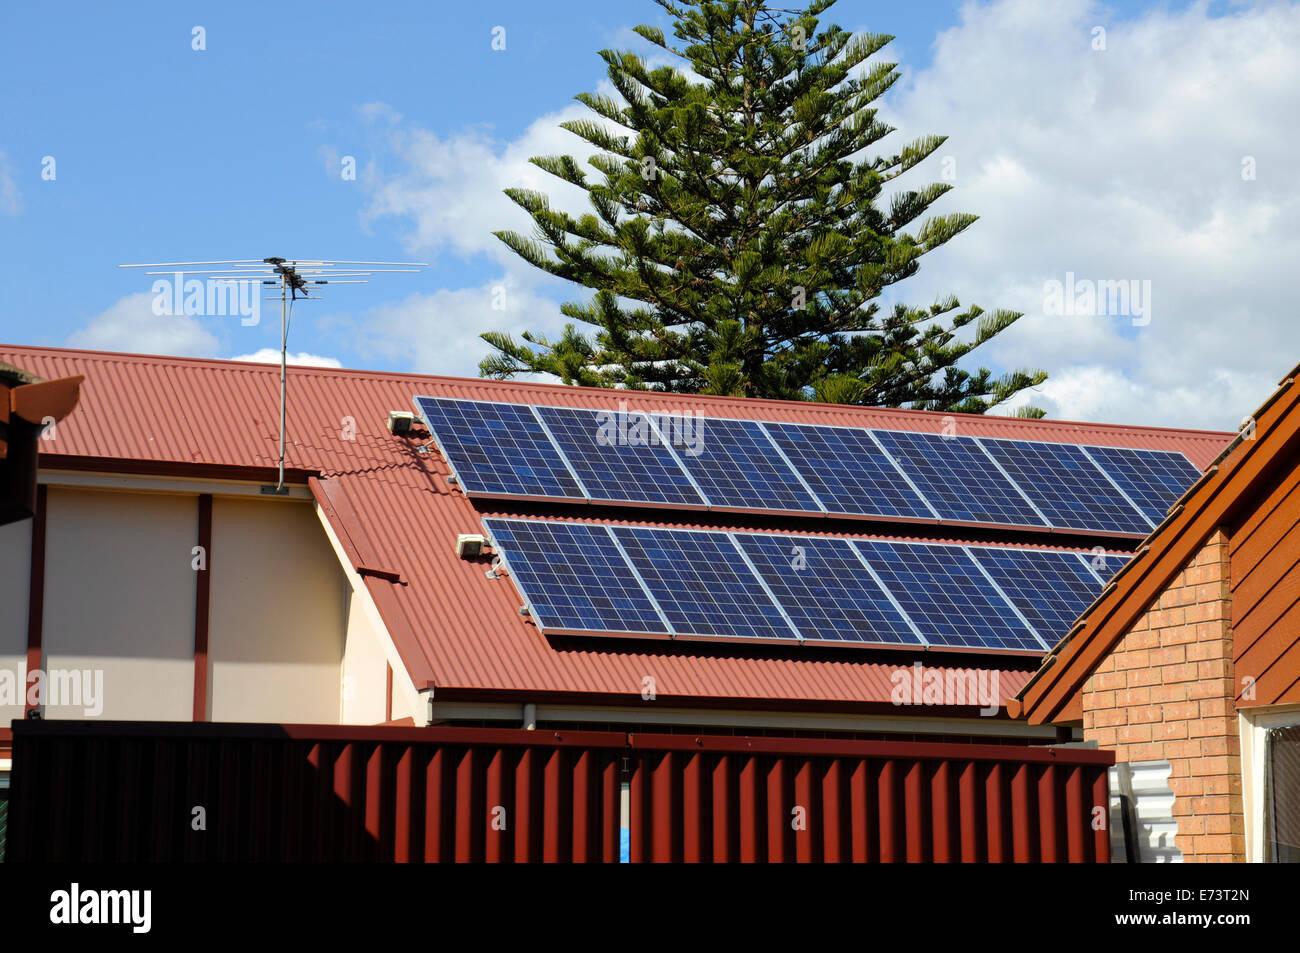 Australian photovoltaic solar power panels on a suburban rooftop. - Stock Image